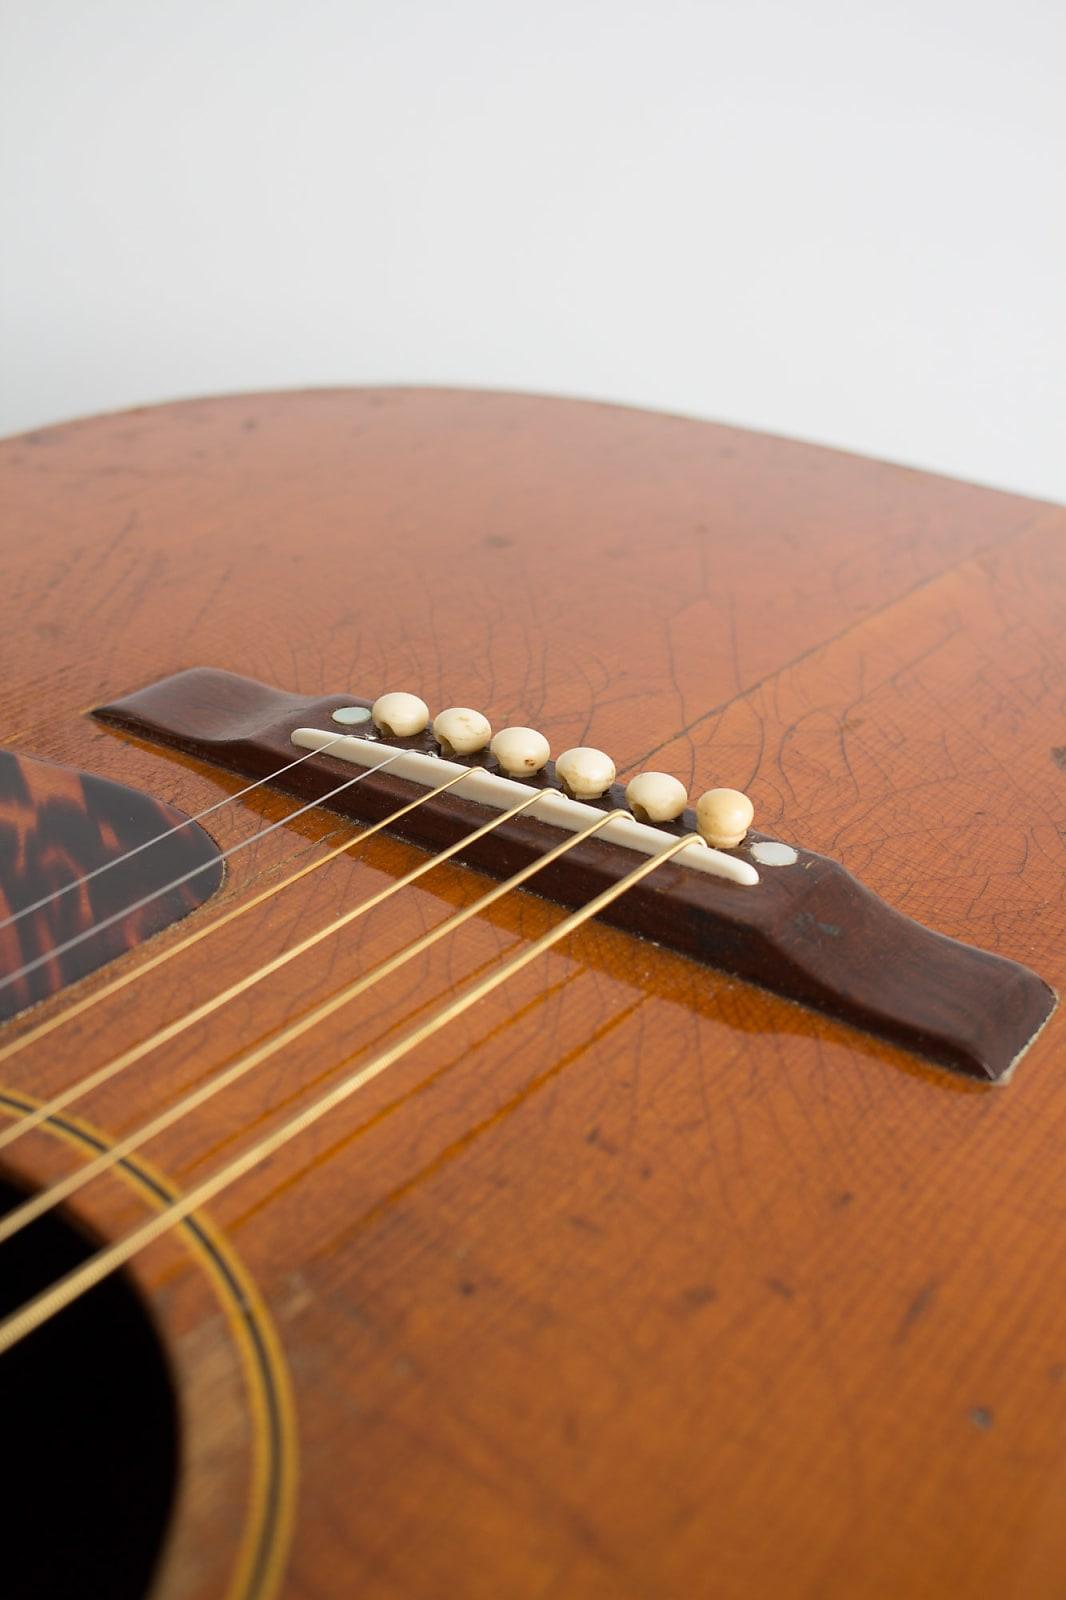 Gibson J 35 Flat Top Acoustic Guitar 1941 Black Hard Shell Case